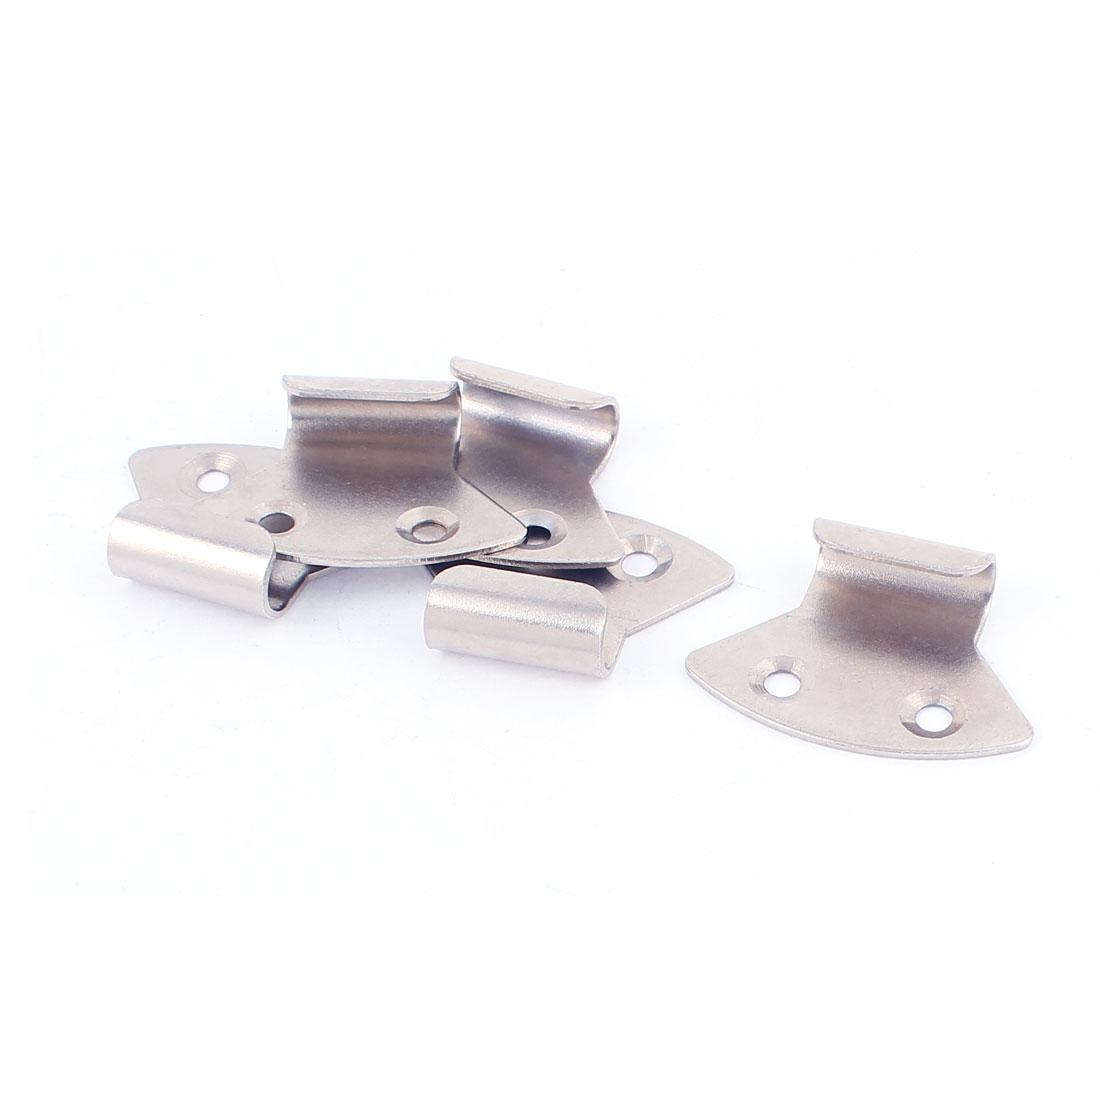 5 Pcs Metal Strike Plate 3.9cm x 2.7cm for Toggle Draw Latch